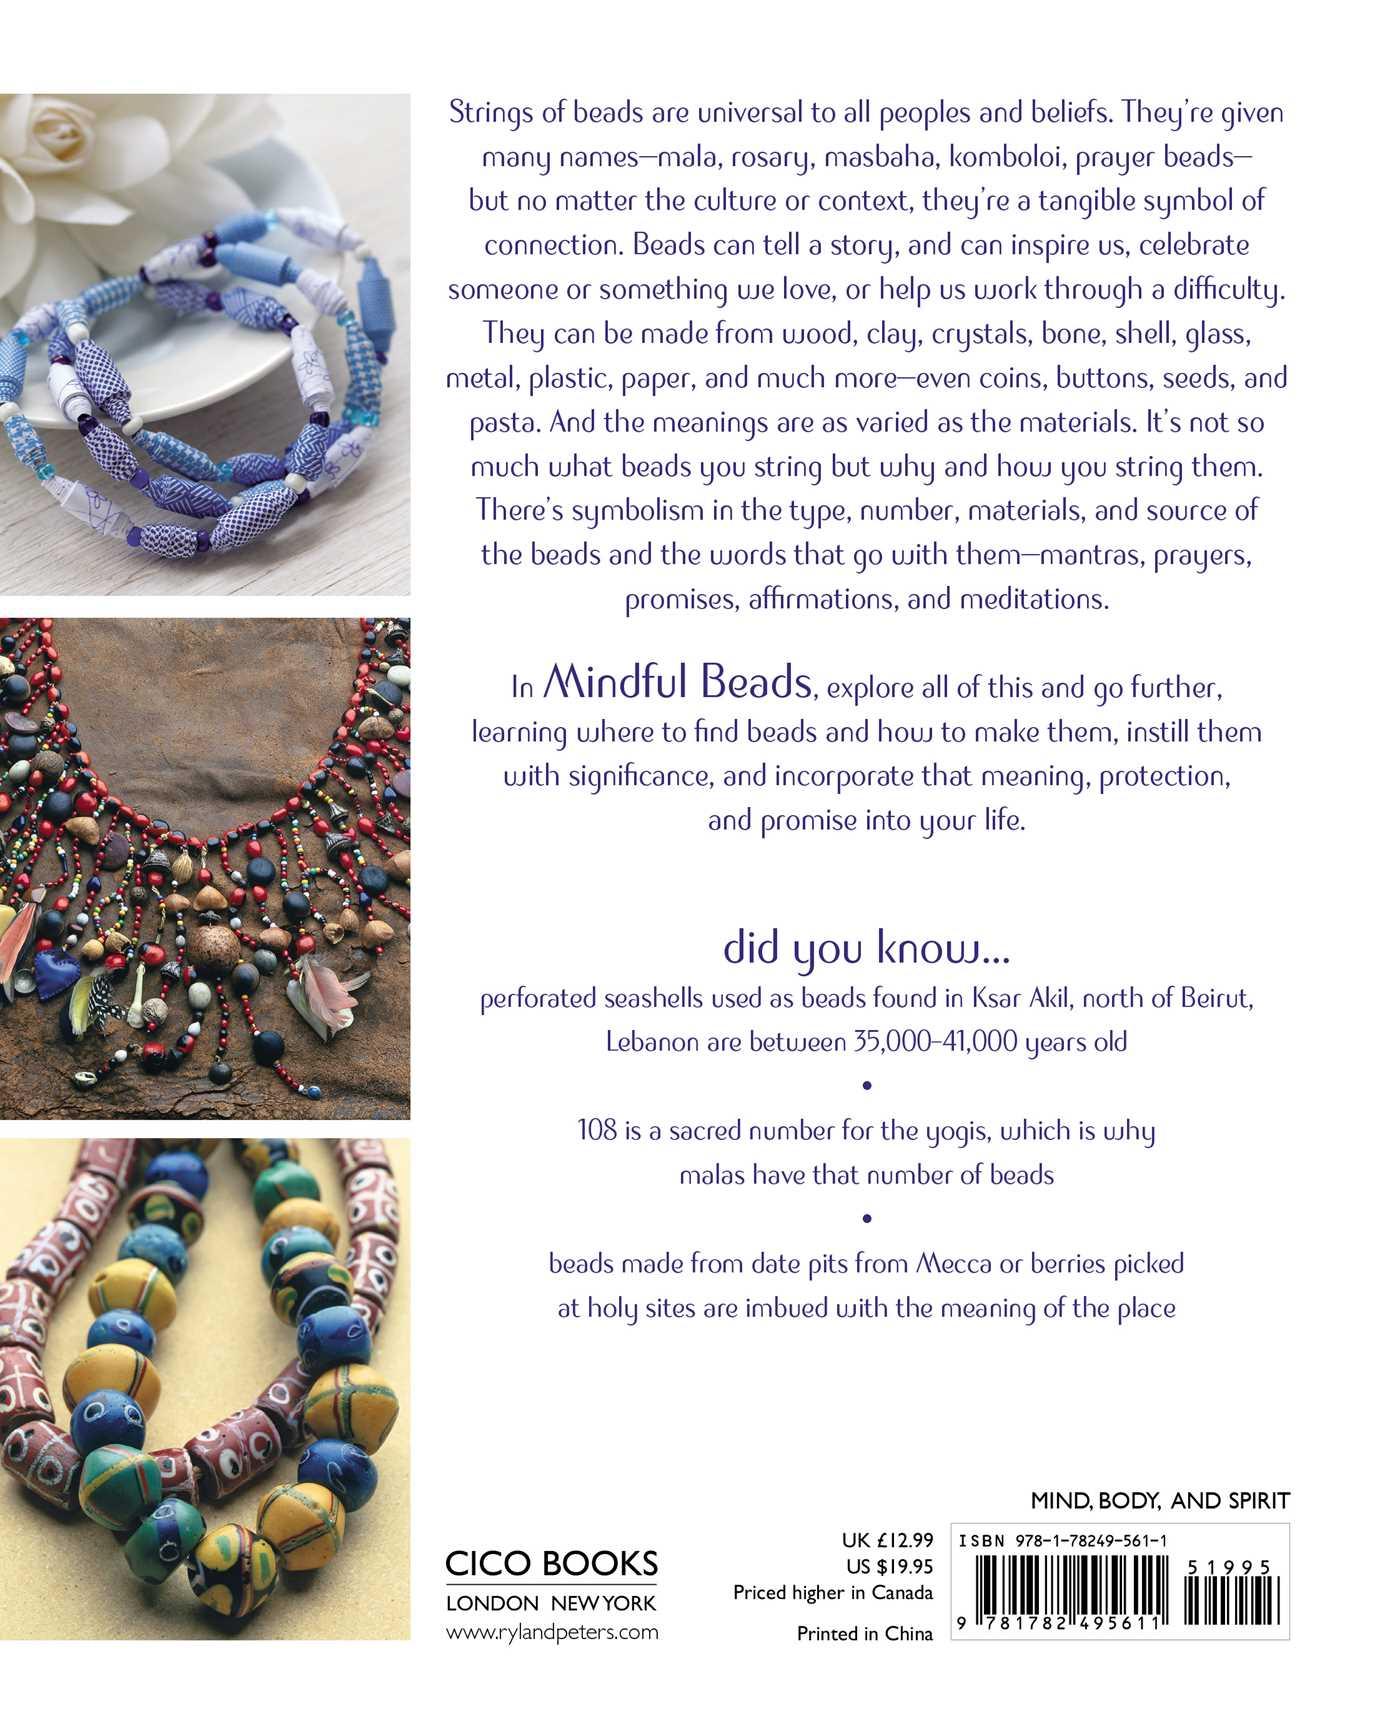 Mindful beads 9781782495611 hr back